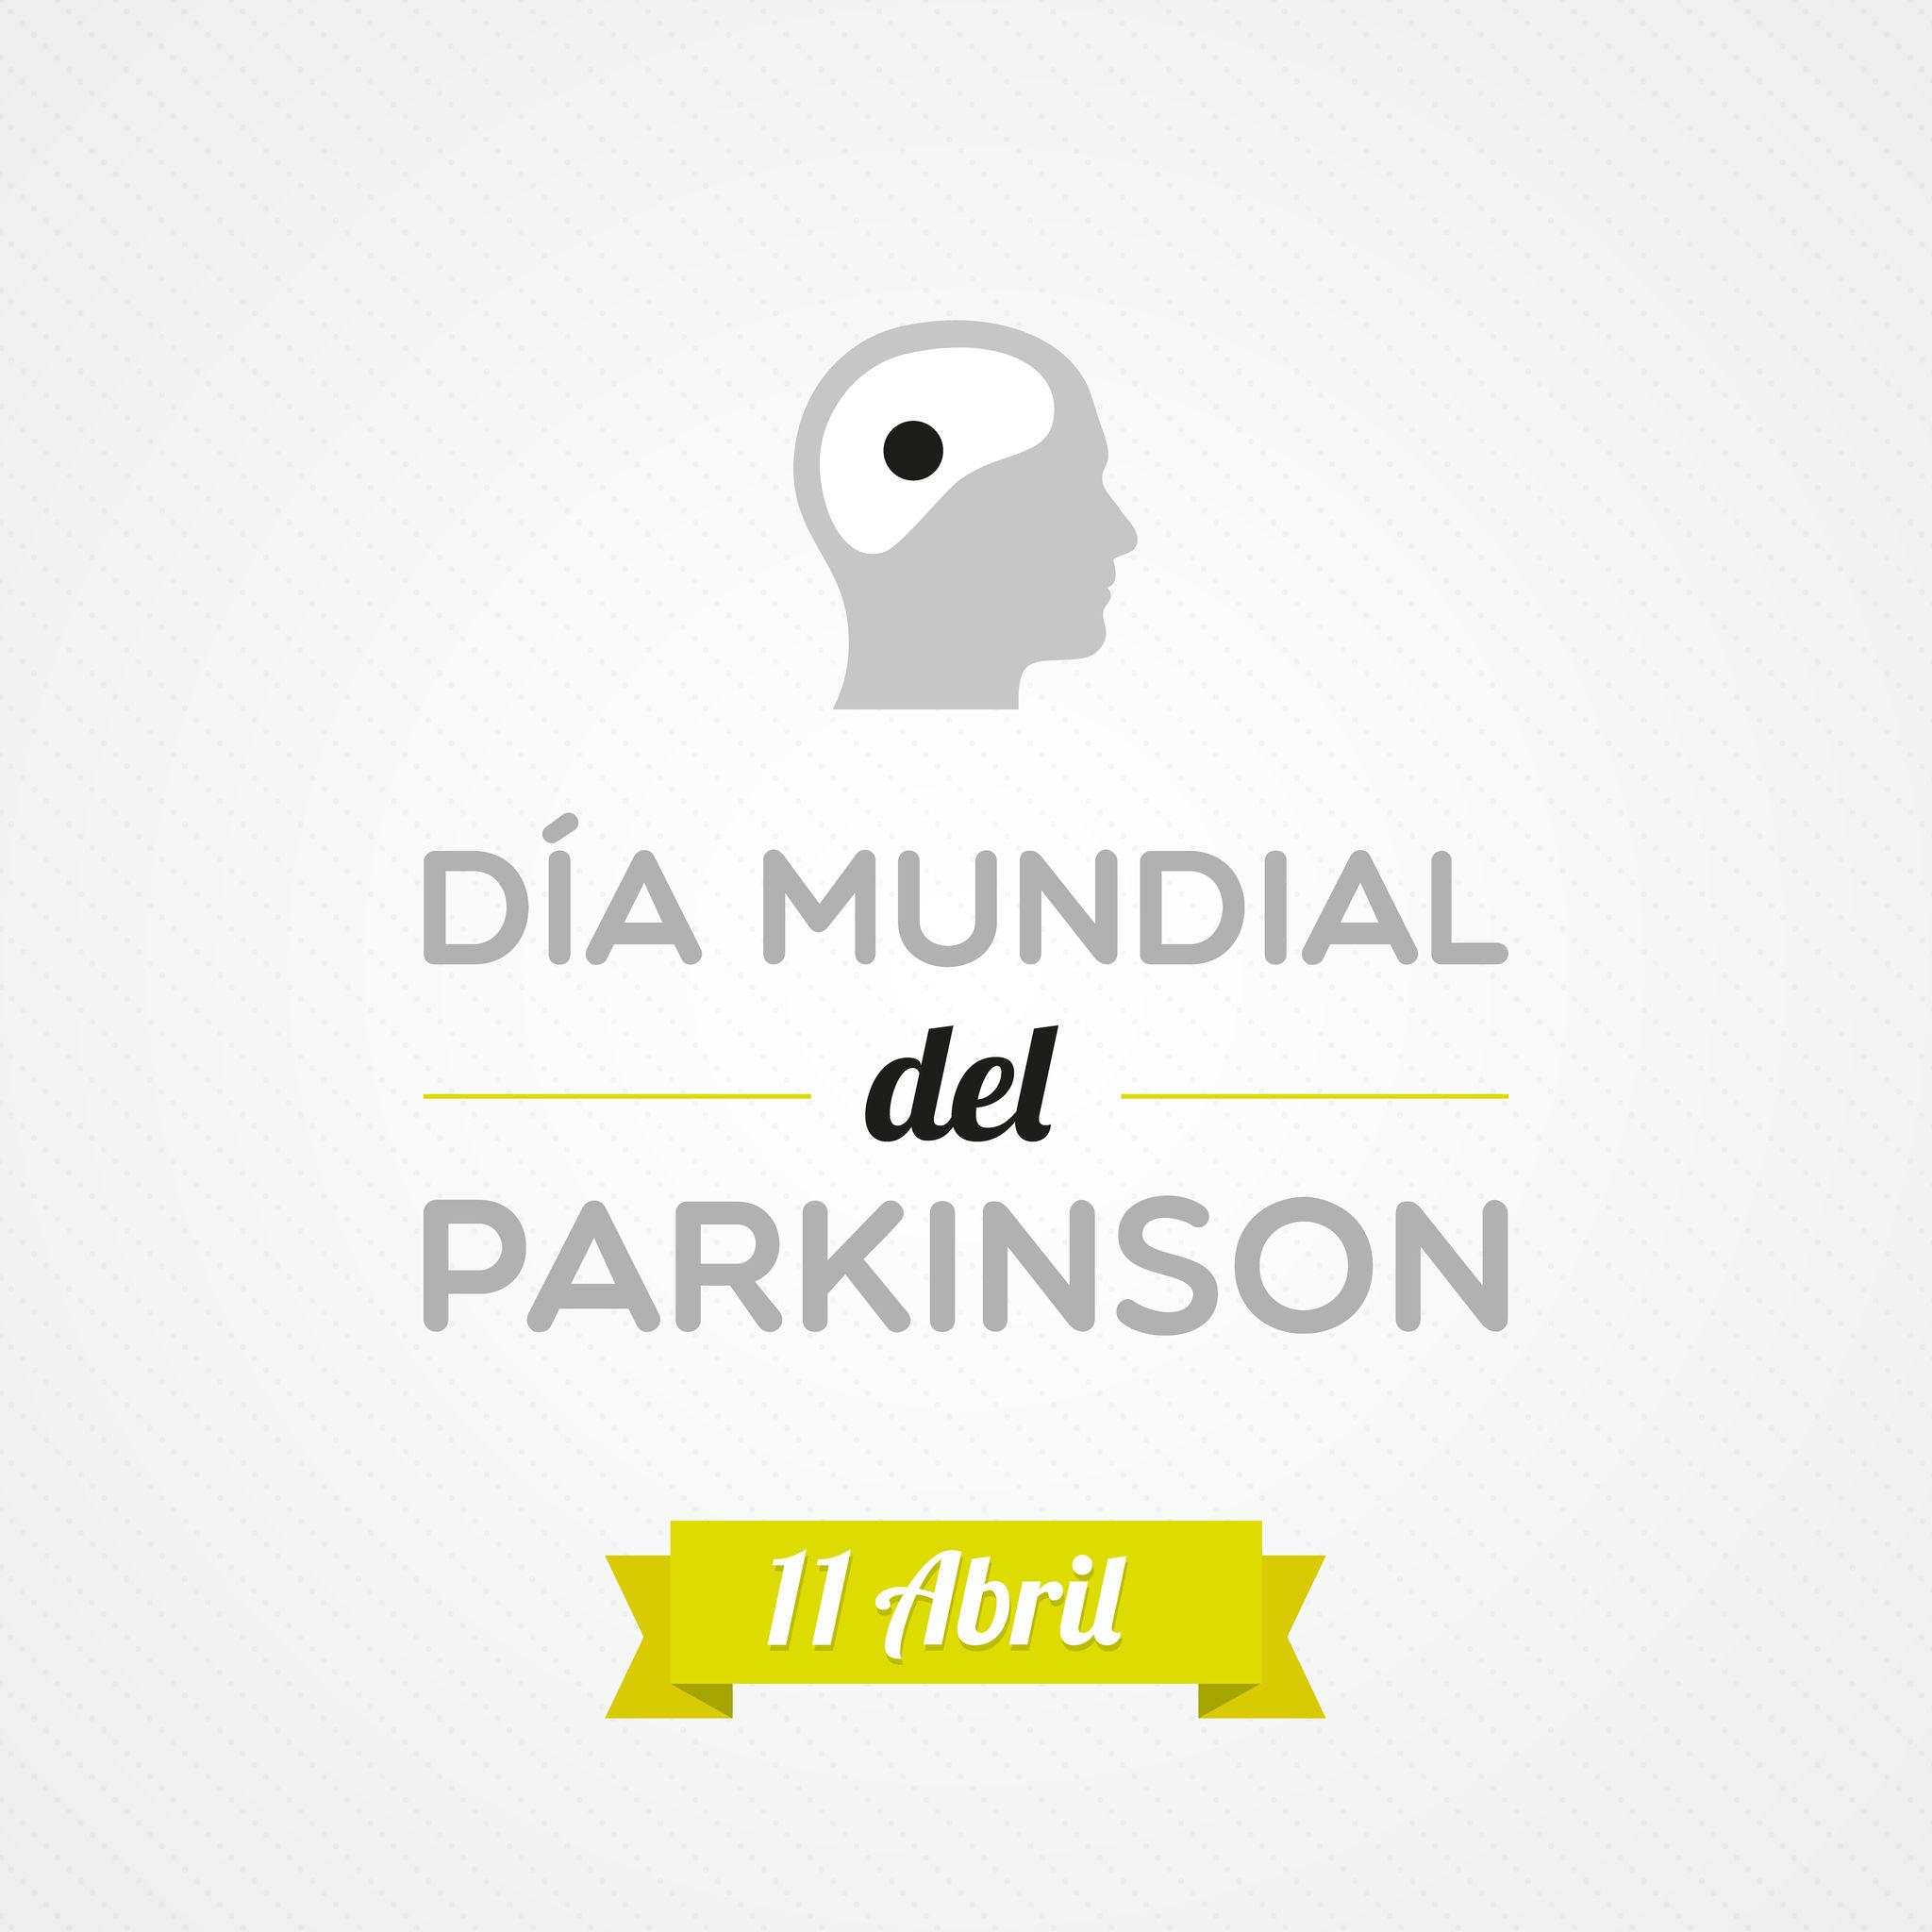 27313474 - world parkinson day in spanish